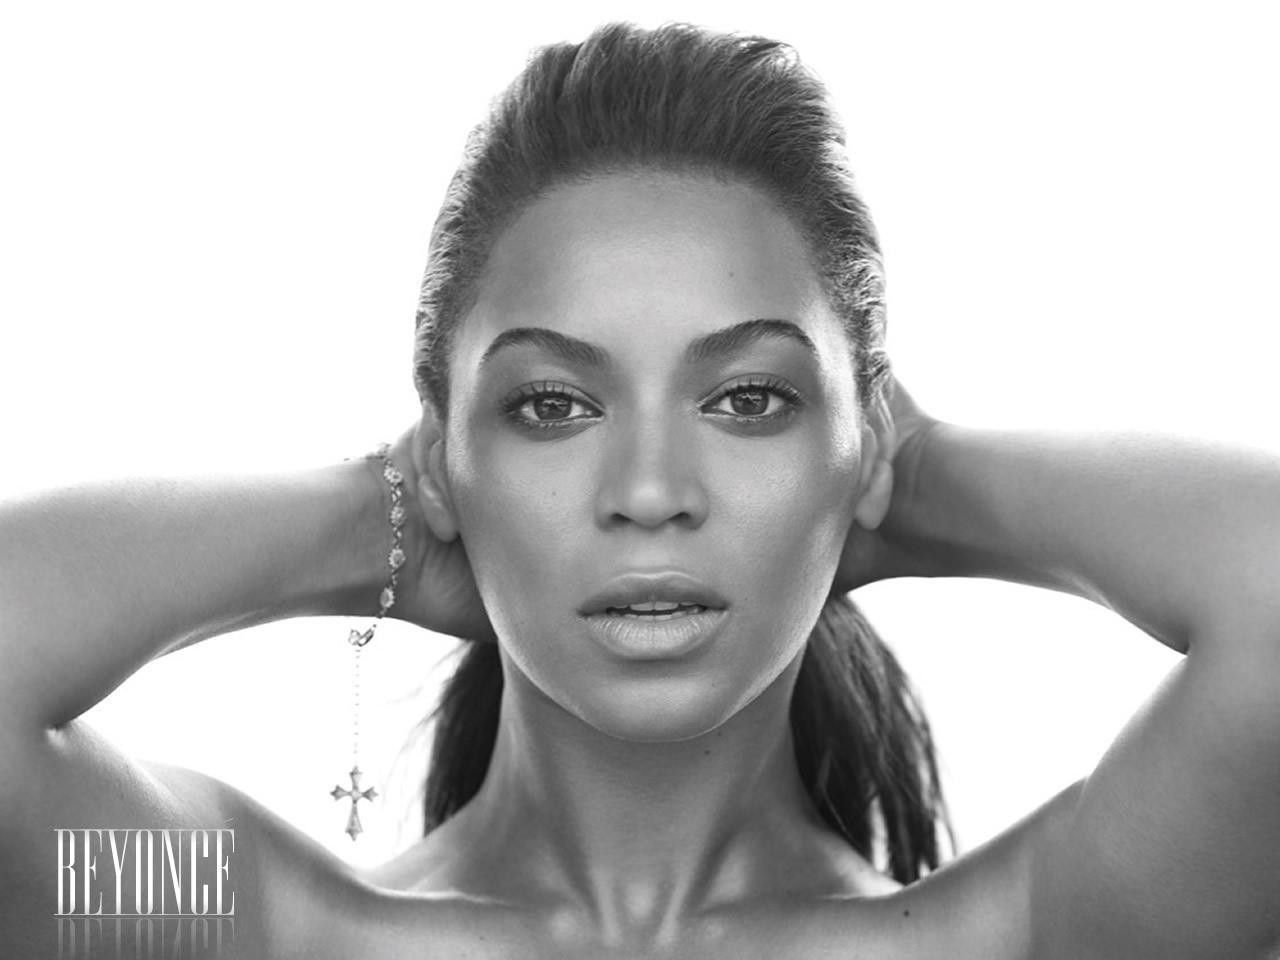 I am - Beyonce Wallpaper (3063404) - Fanpop